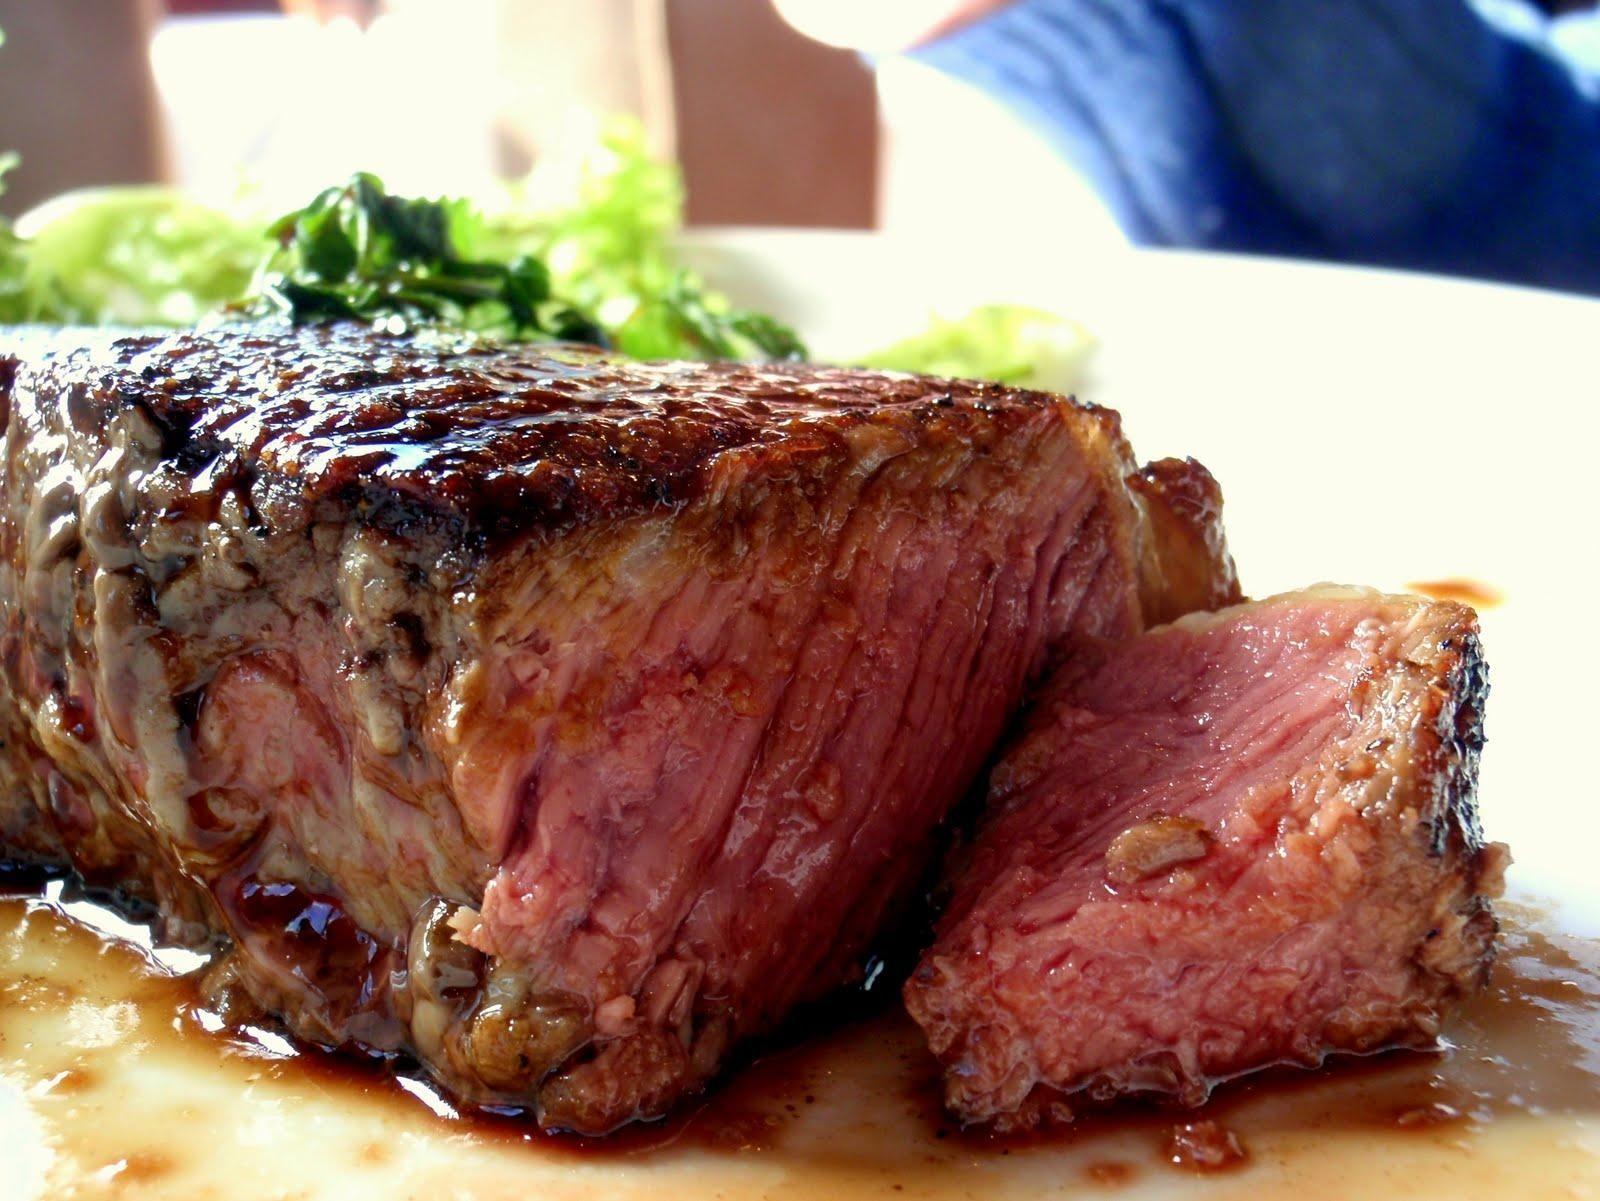 Sirloin Steak With Port Wine Jus 1600 X 1201 Foodporn Food Foodie Yummy Yum Foodgasm Nomnom Delicious Recipe Man Food Food Full Meal Recipes